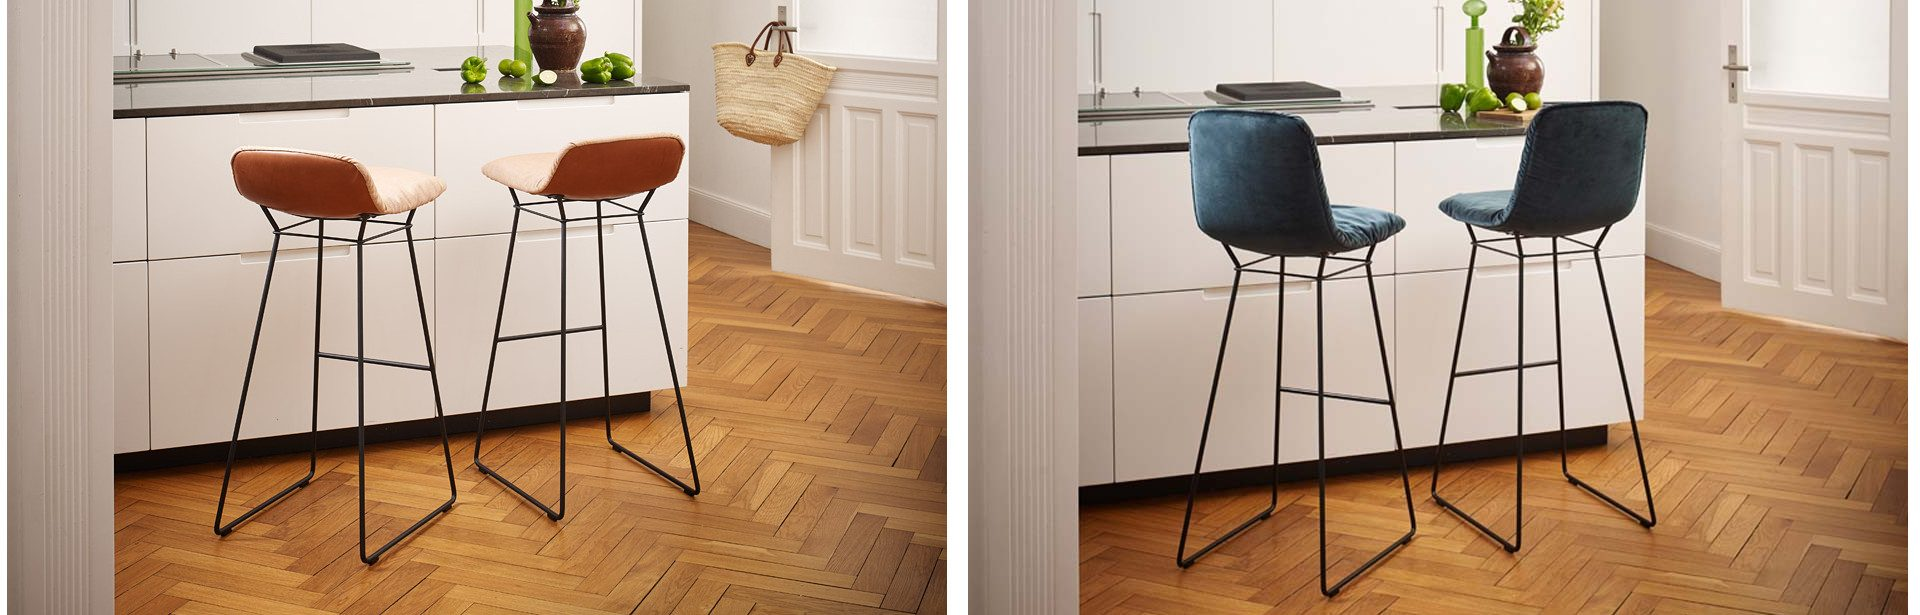 freifrau ihr lieblingsst ck unter den barhockern. Black Bedroom Furniture Sets. Home Design Ideas